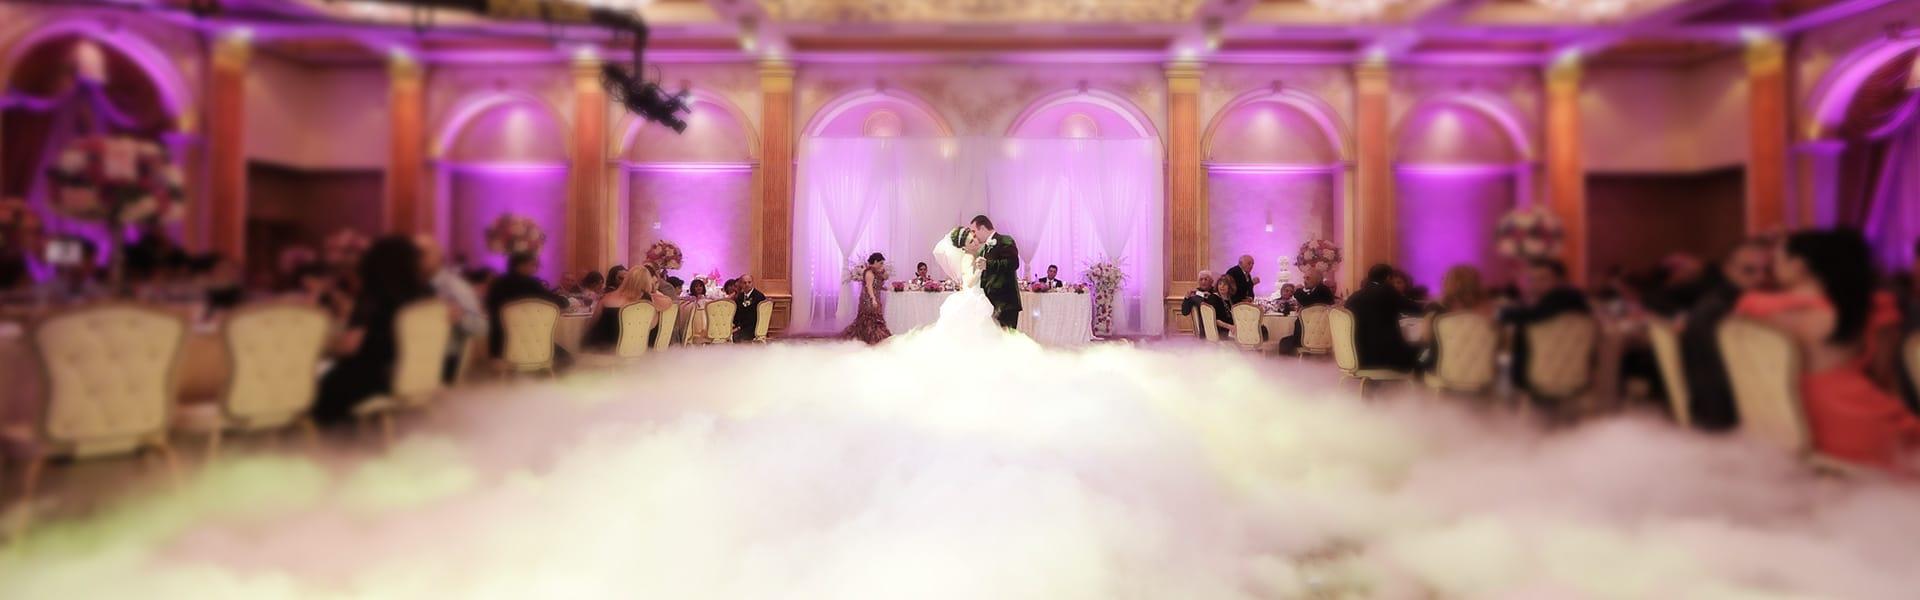 Renaissance Banquet Hall - Wedding Events